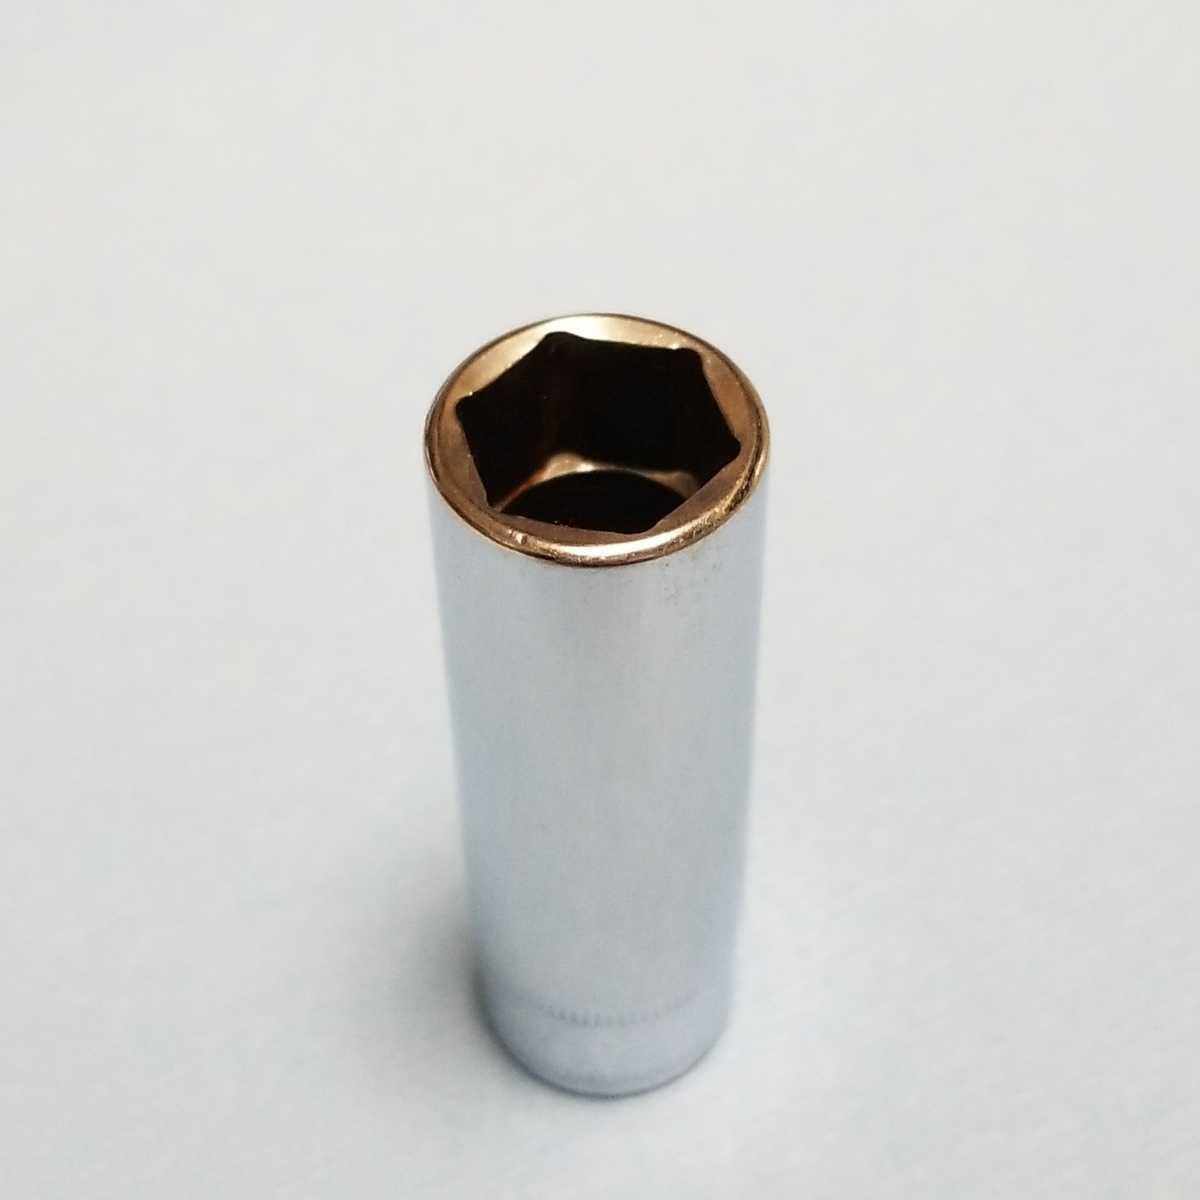 14mm 3/8 ディープ スナップオン SFSM14 (6角) 中古品 美品 保管品 SNAPON SNAP-ON ディープソケット ソケット 送料無料 Snap-on _画像3